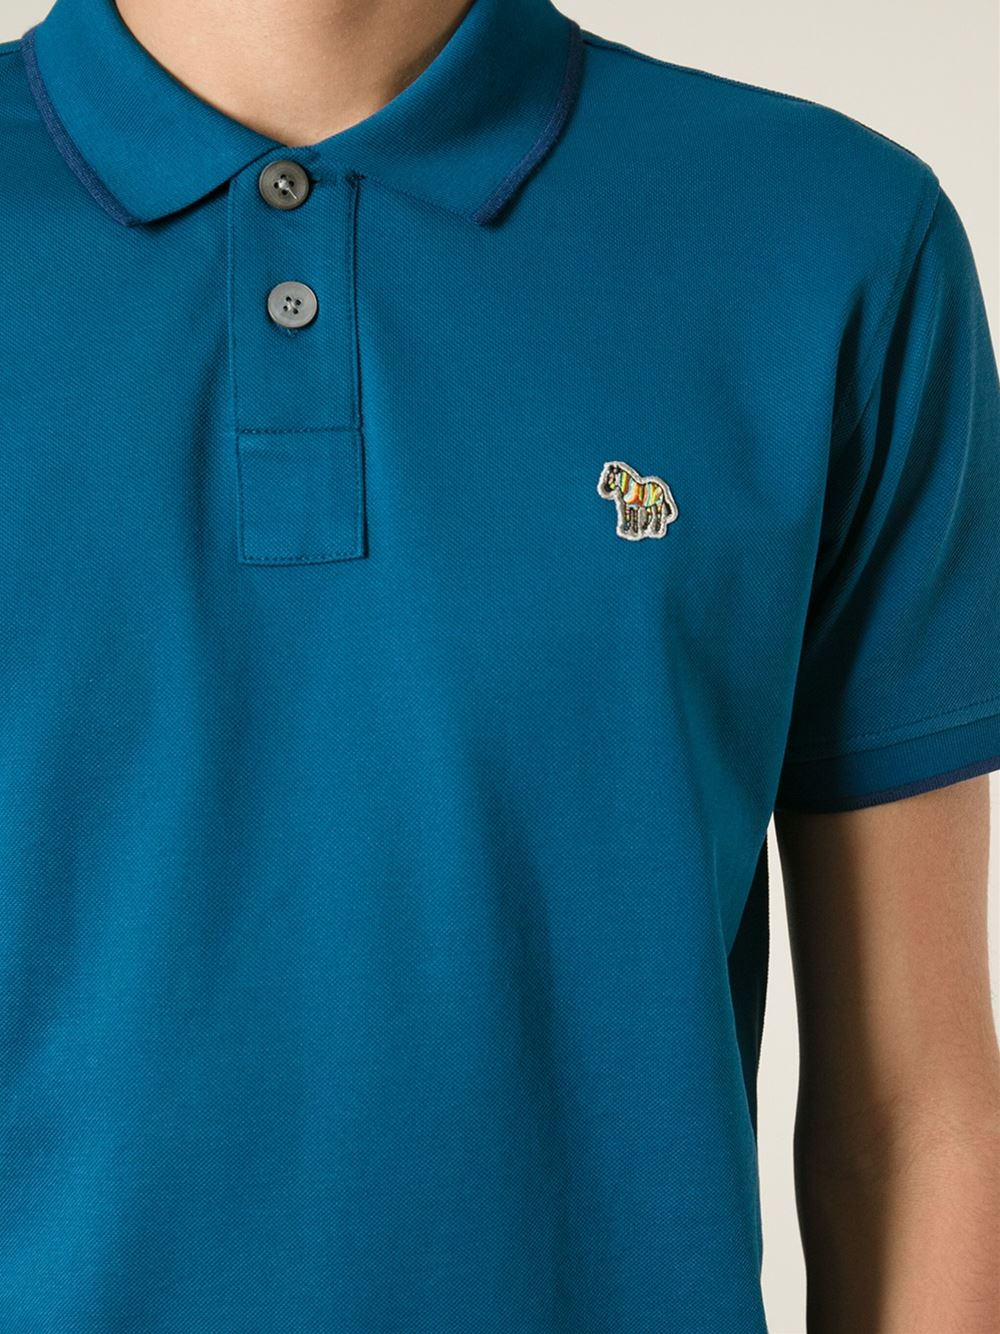 efa53528 Paul Smith Zebra Polo Shirt in Blue for Men - Lyst